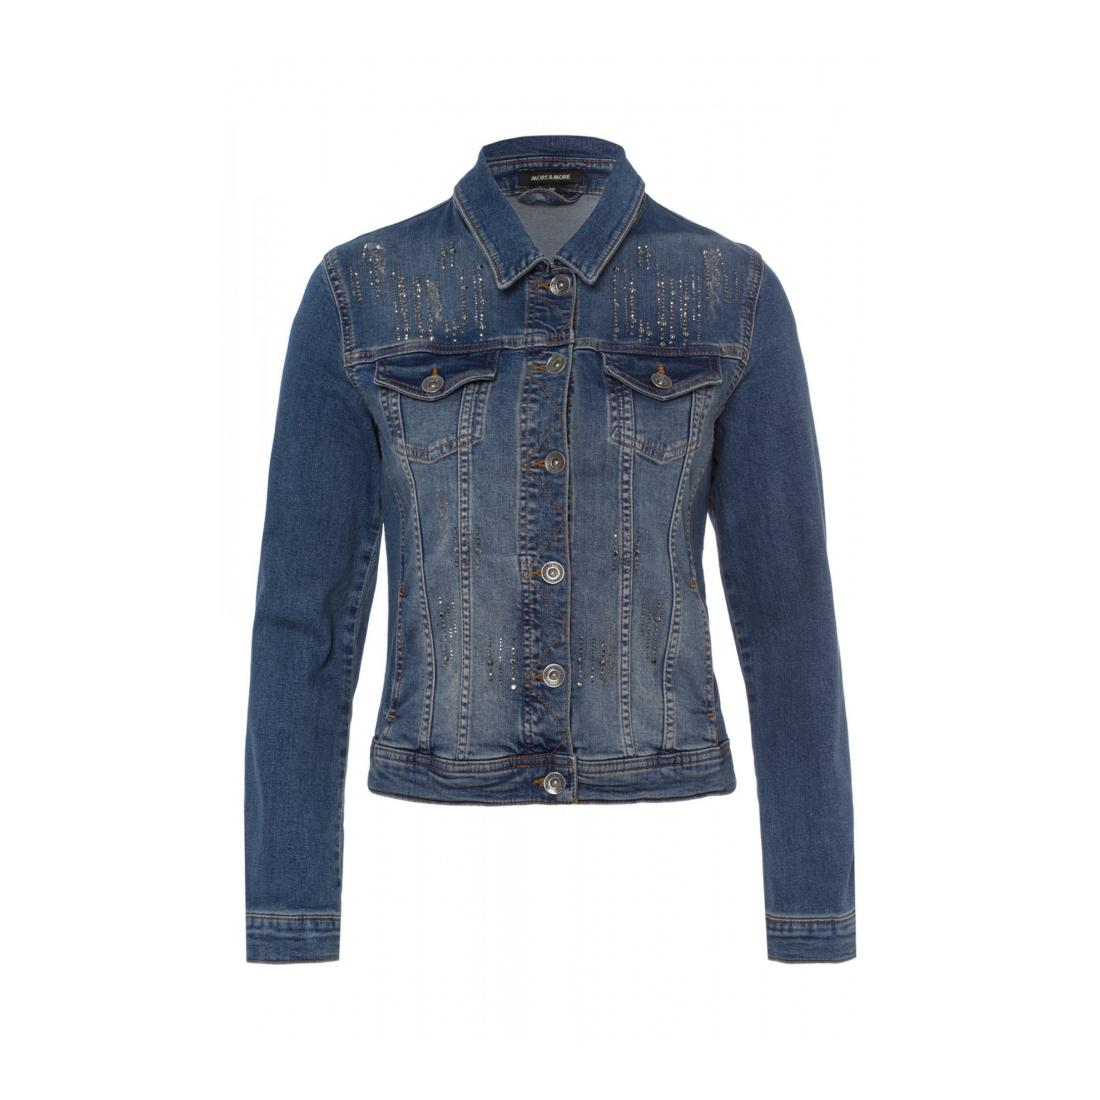 More & More Jacke kurz Damen Glamorous Denim Jacket Ac